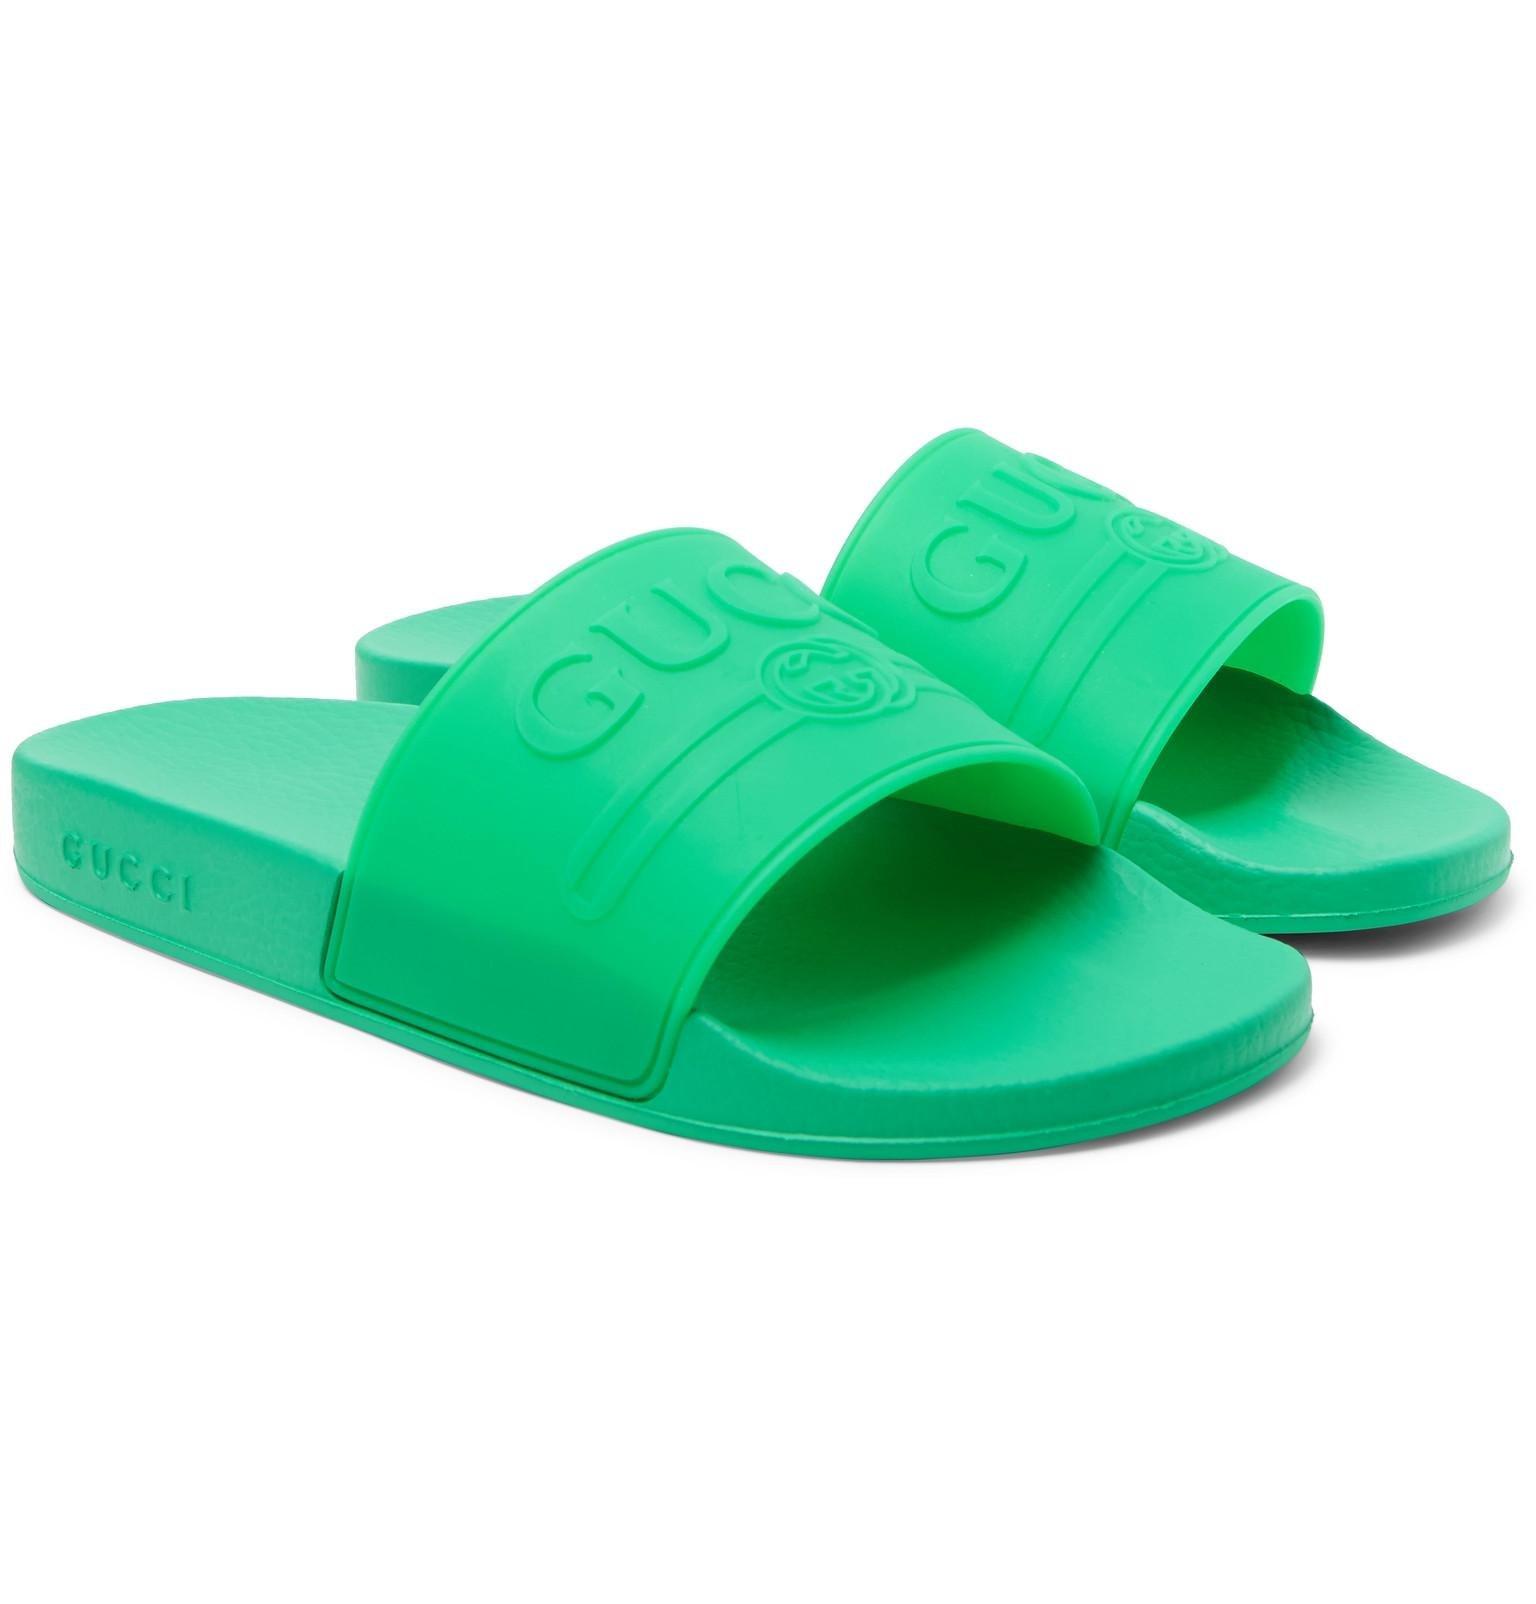 5d9ba29eab356 Gucci Pursuit Rubber Slides in Green for Men - Save 39% - Lyst